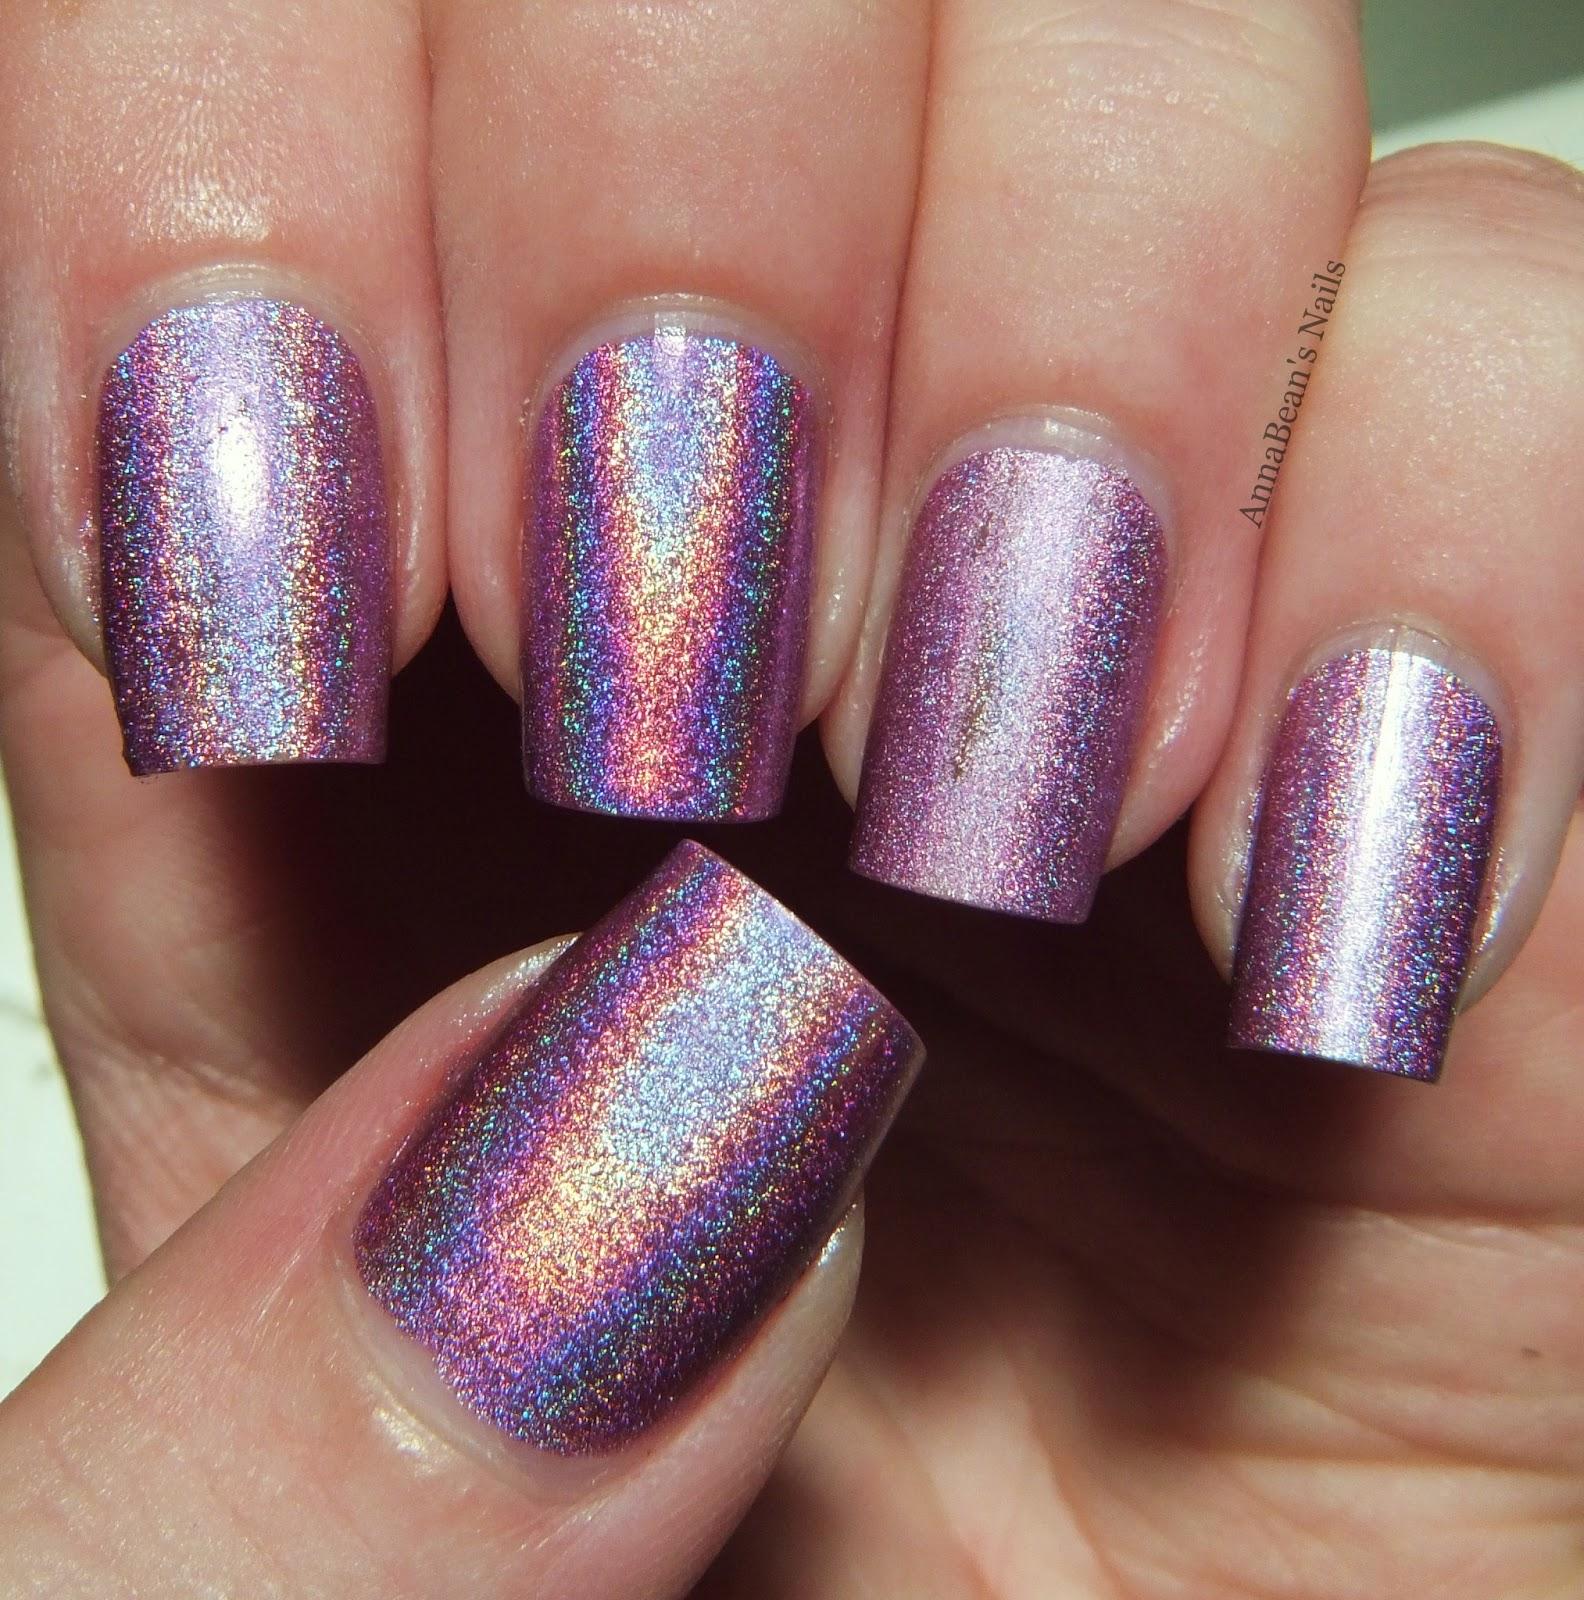 Base Nail Polish: AnnaBean's Nails: Do You Really Need Aqua Base With